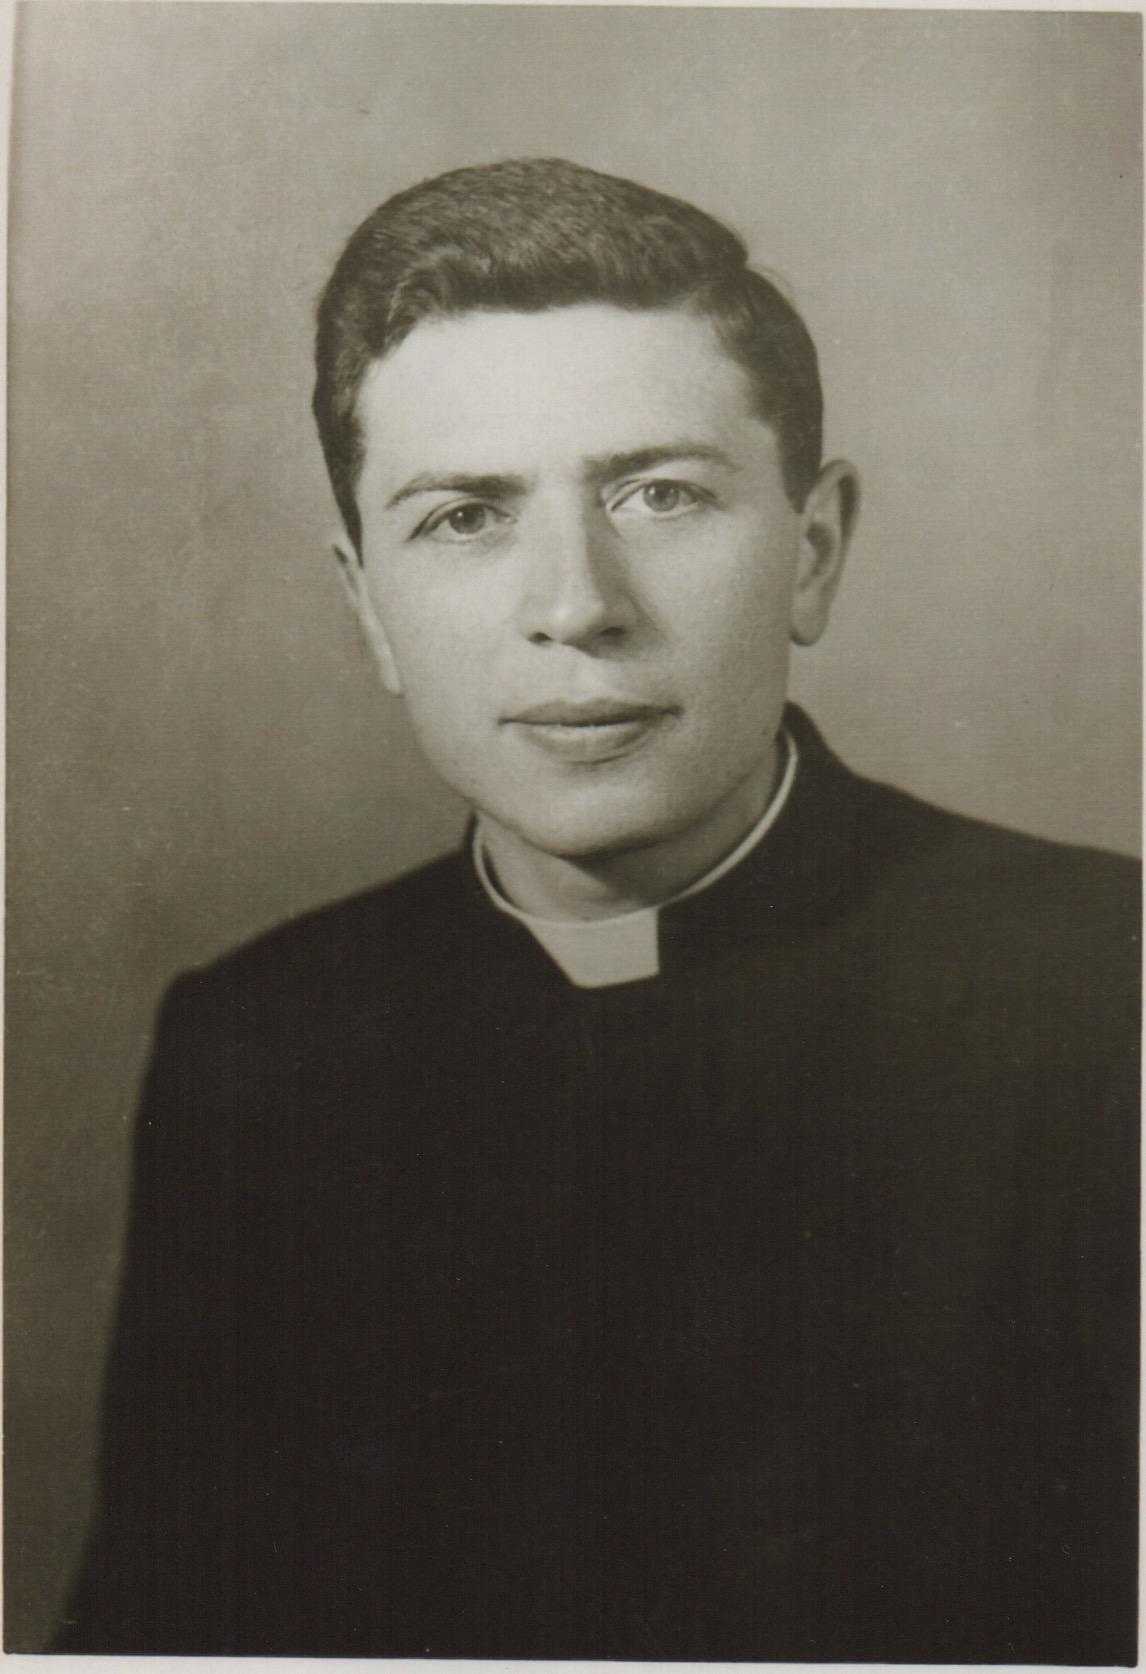 Padre Juan Bertolone - Missionario salesiano Chierese in Argentina.